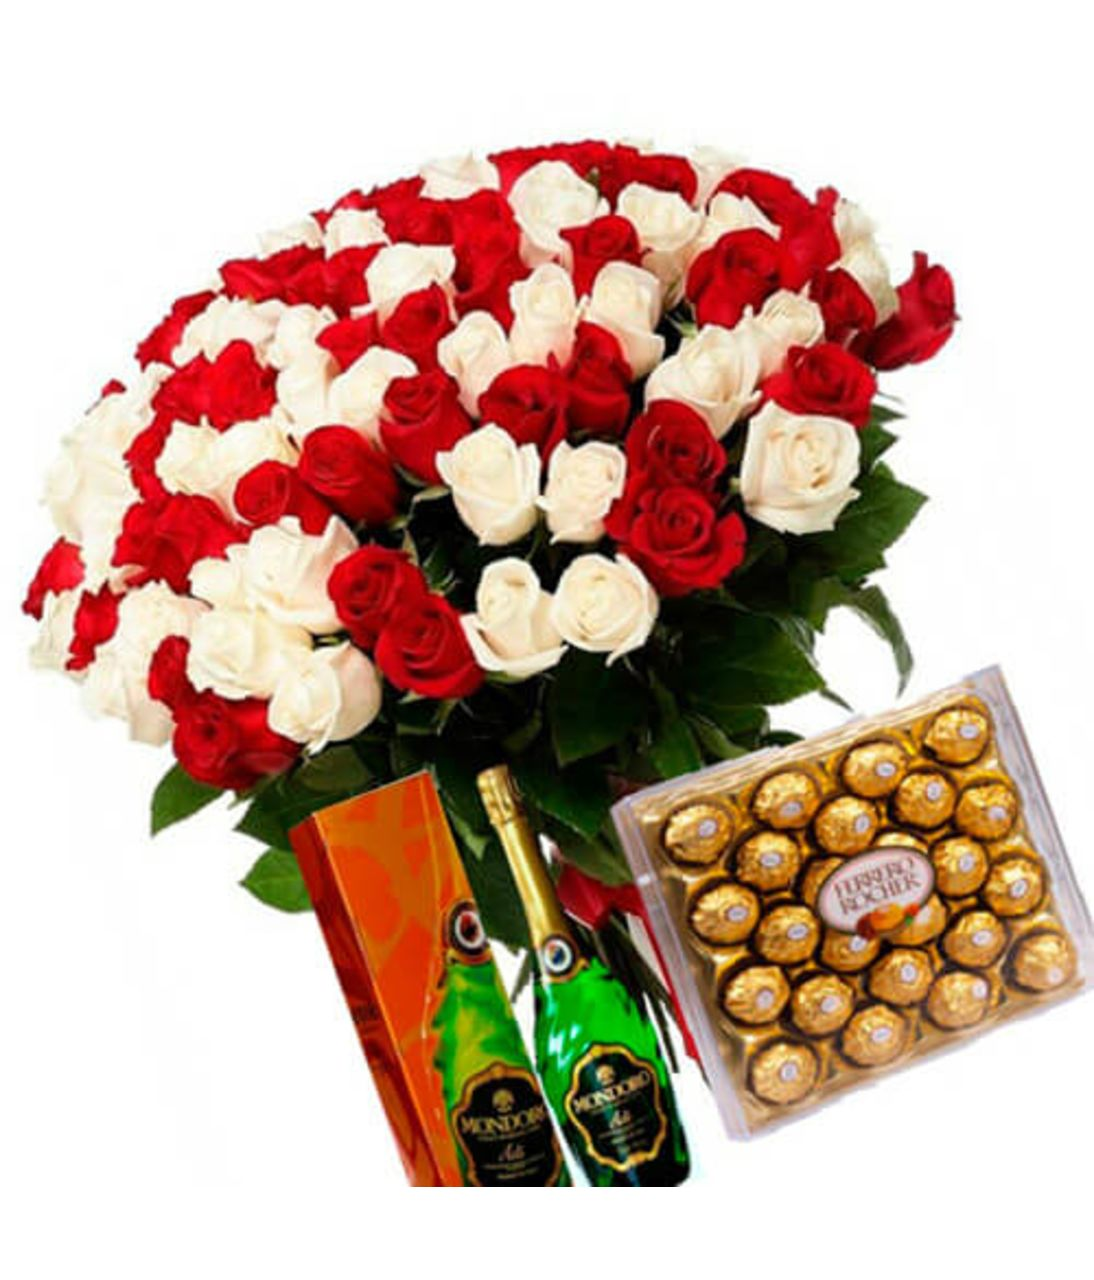 101 червоно-біла троянда. Superflowers.com.ua.